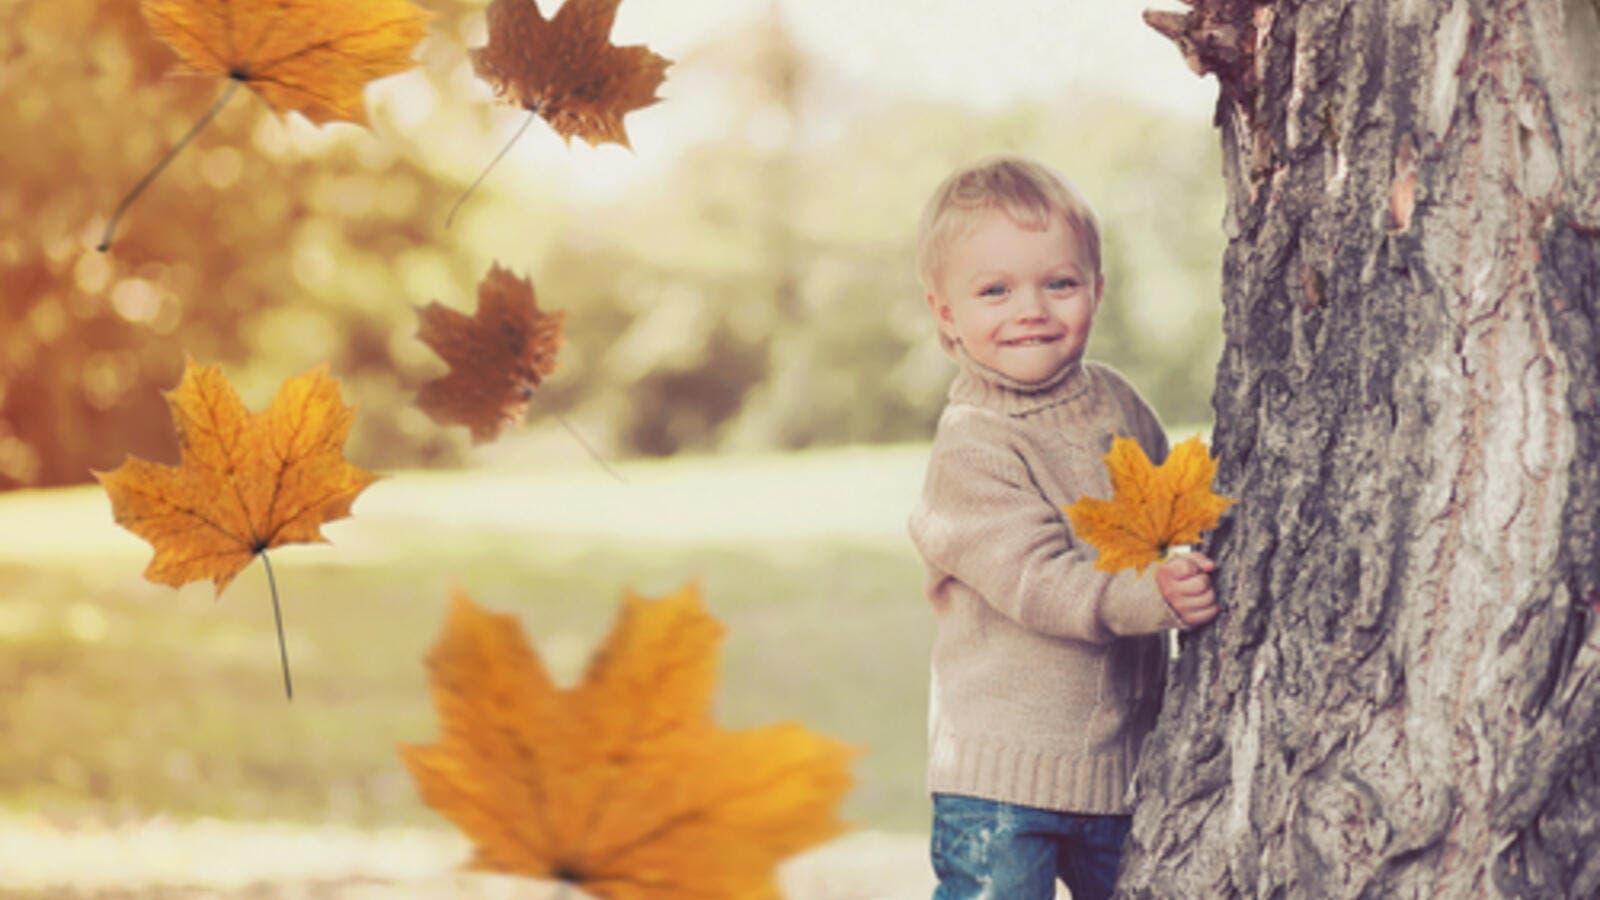 802bf00fc046b أهم النصائح لاختيار الملابس المناسبة لطفلك في الخريف